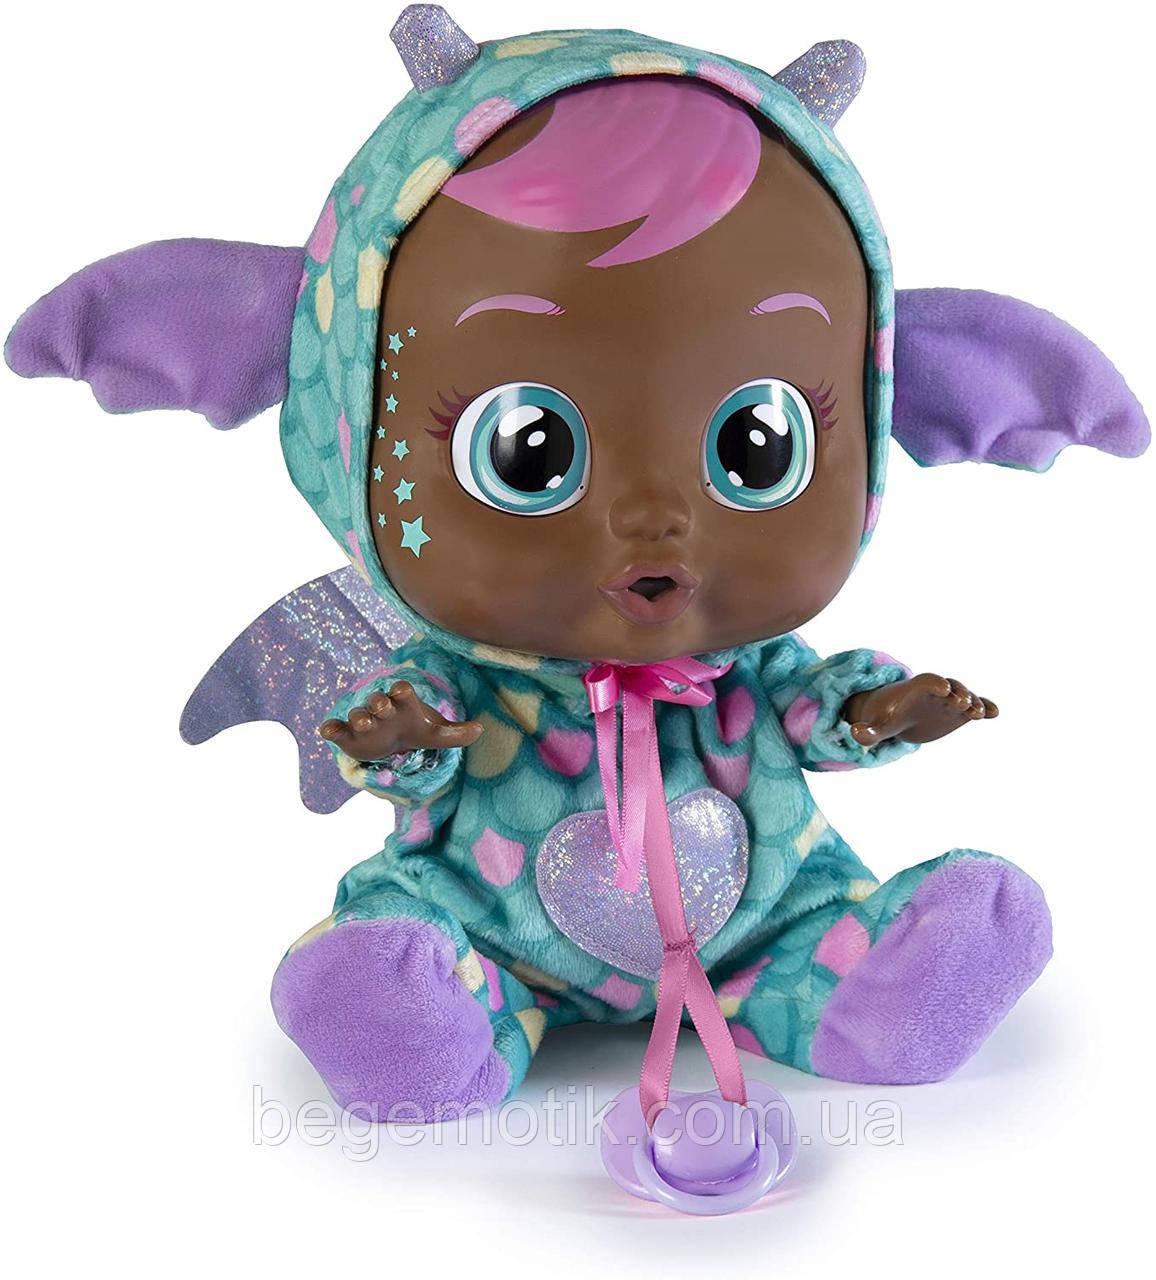 Интерактивная Кукла плакса IMC Toys Cry Babies Hally The Dragon Doll  Пупс дракончик Халли